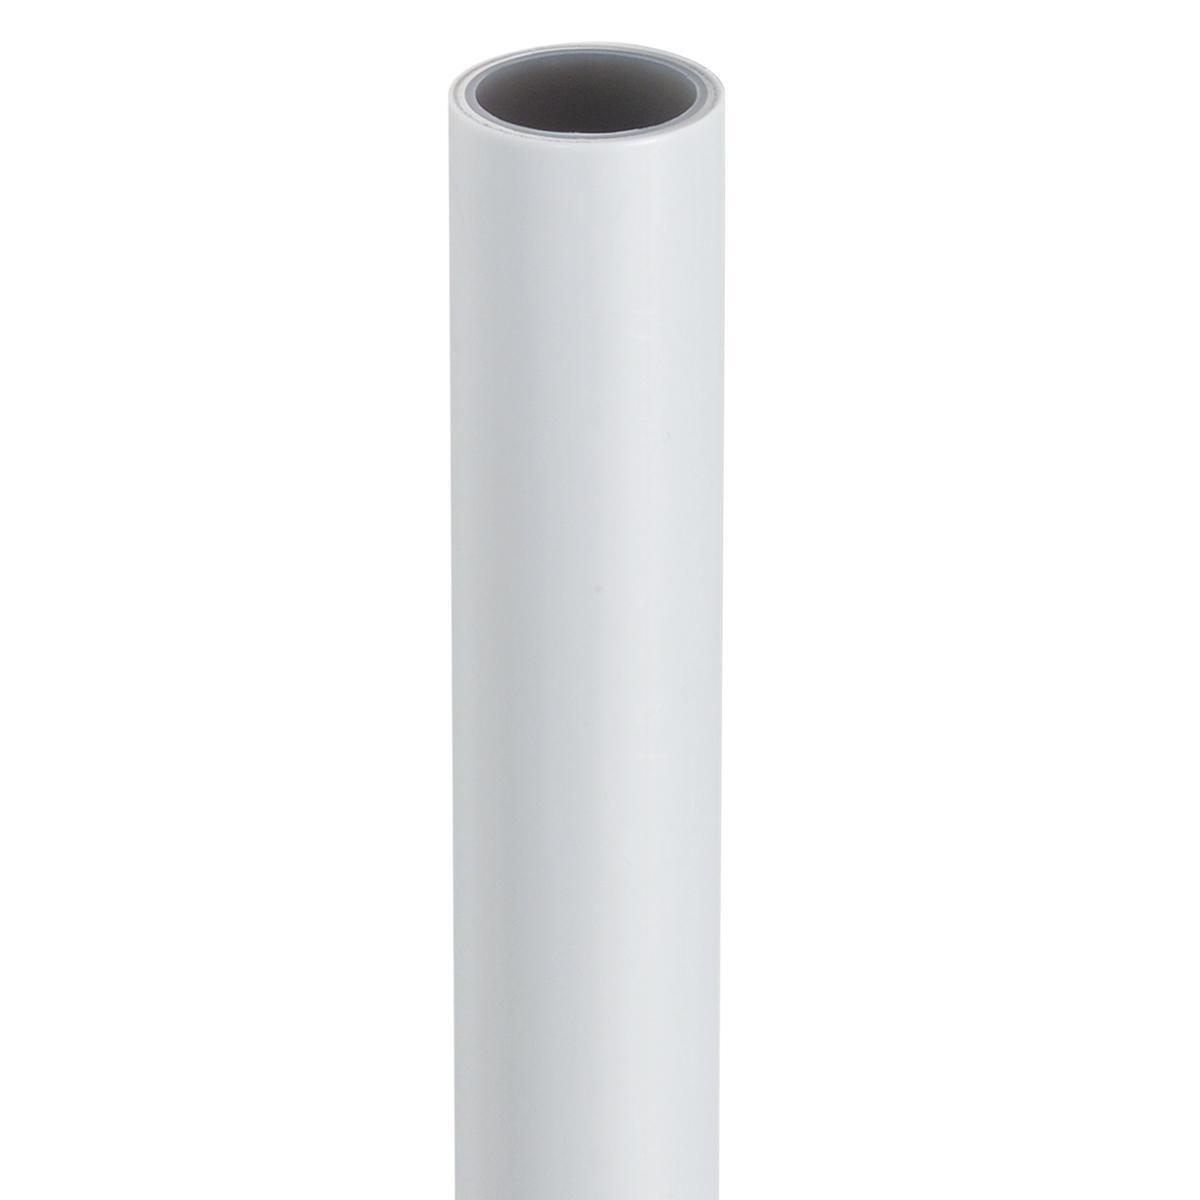 Tubo in barre multistrato nudo EMMETI Ø 16 mm x L 2 m - 1